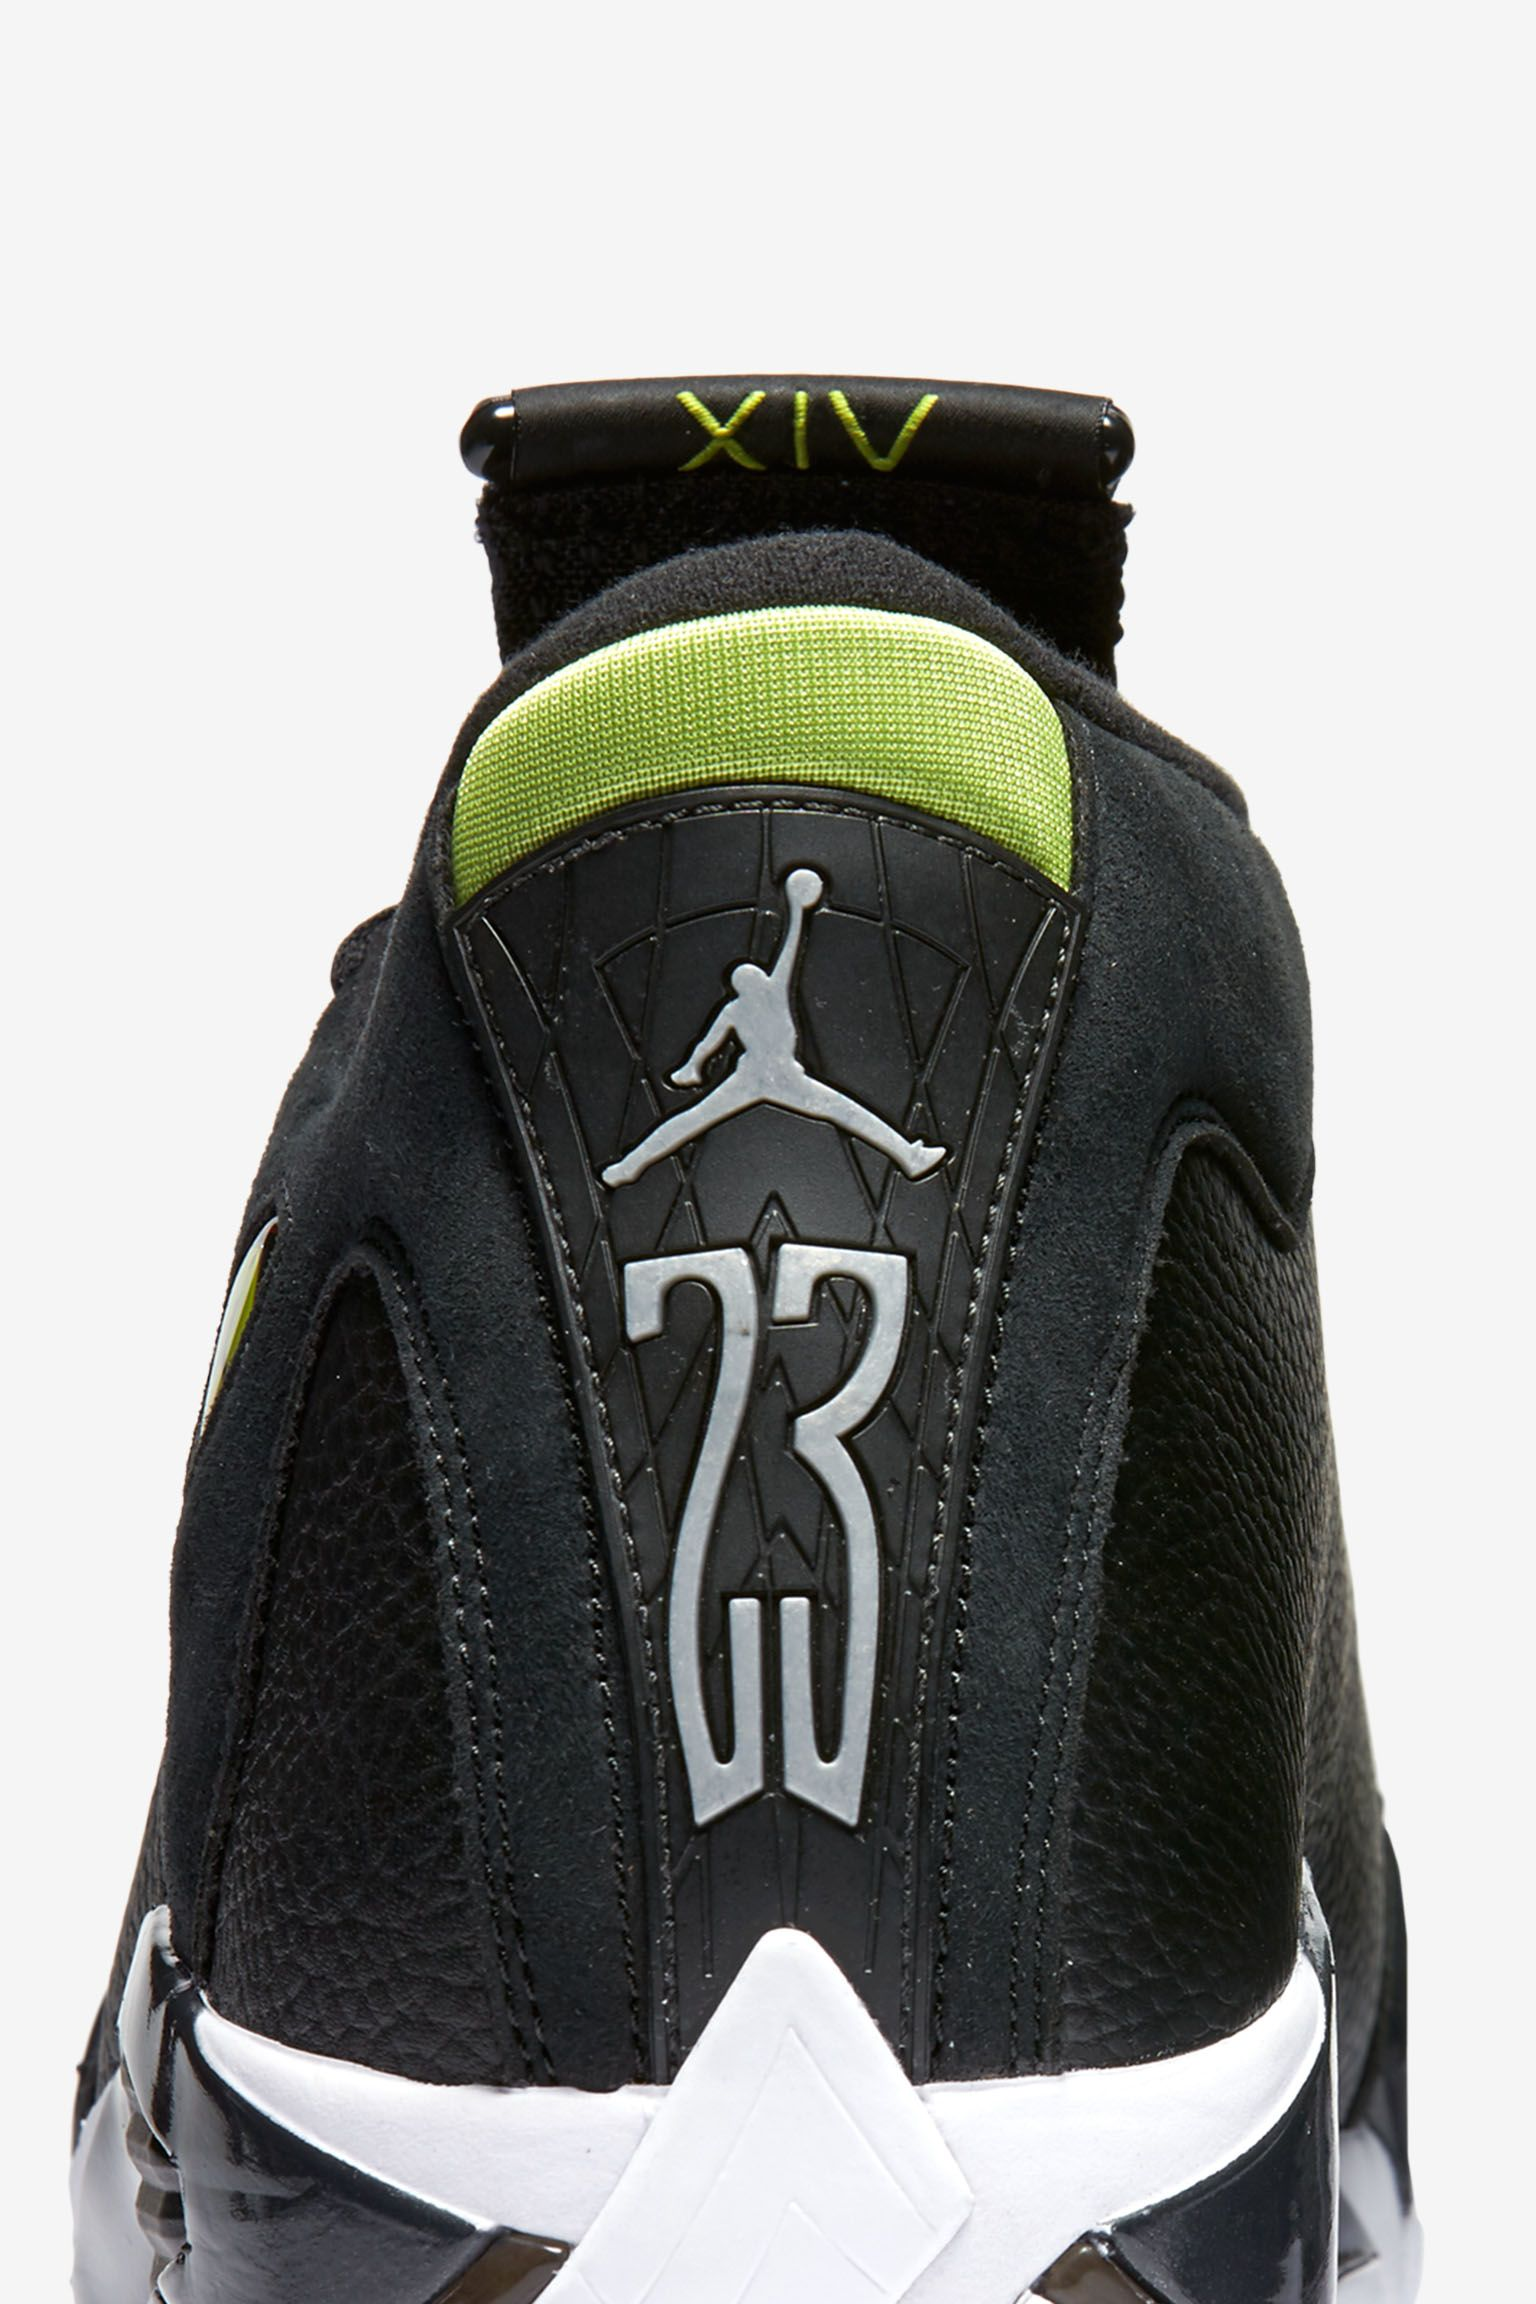 Air Jordan 14 Retro 'Indiglo' Release Date